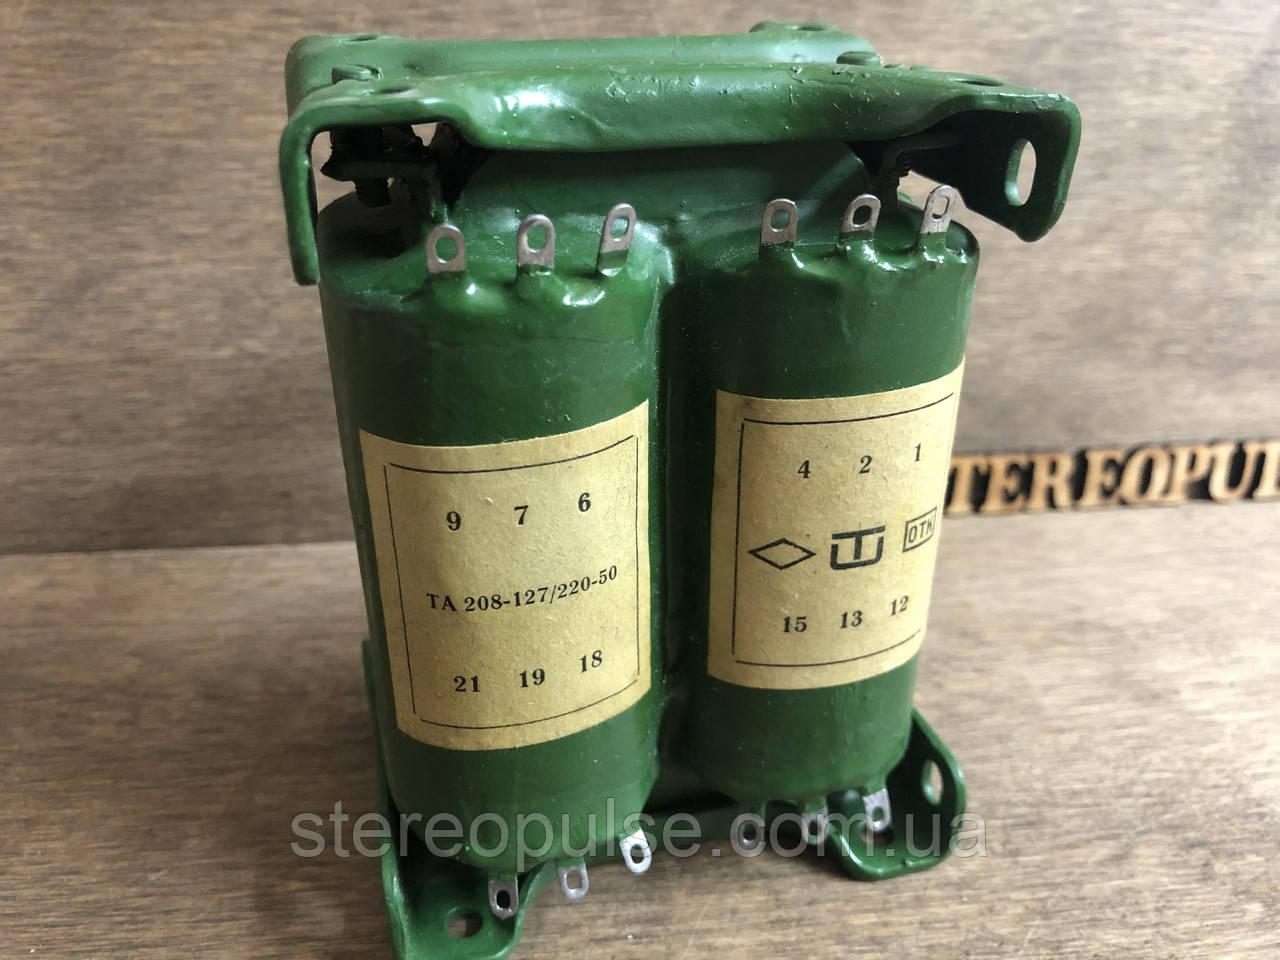 Трансформатор ТА208-127/220-50 135Вт